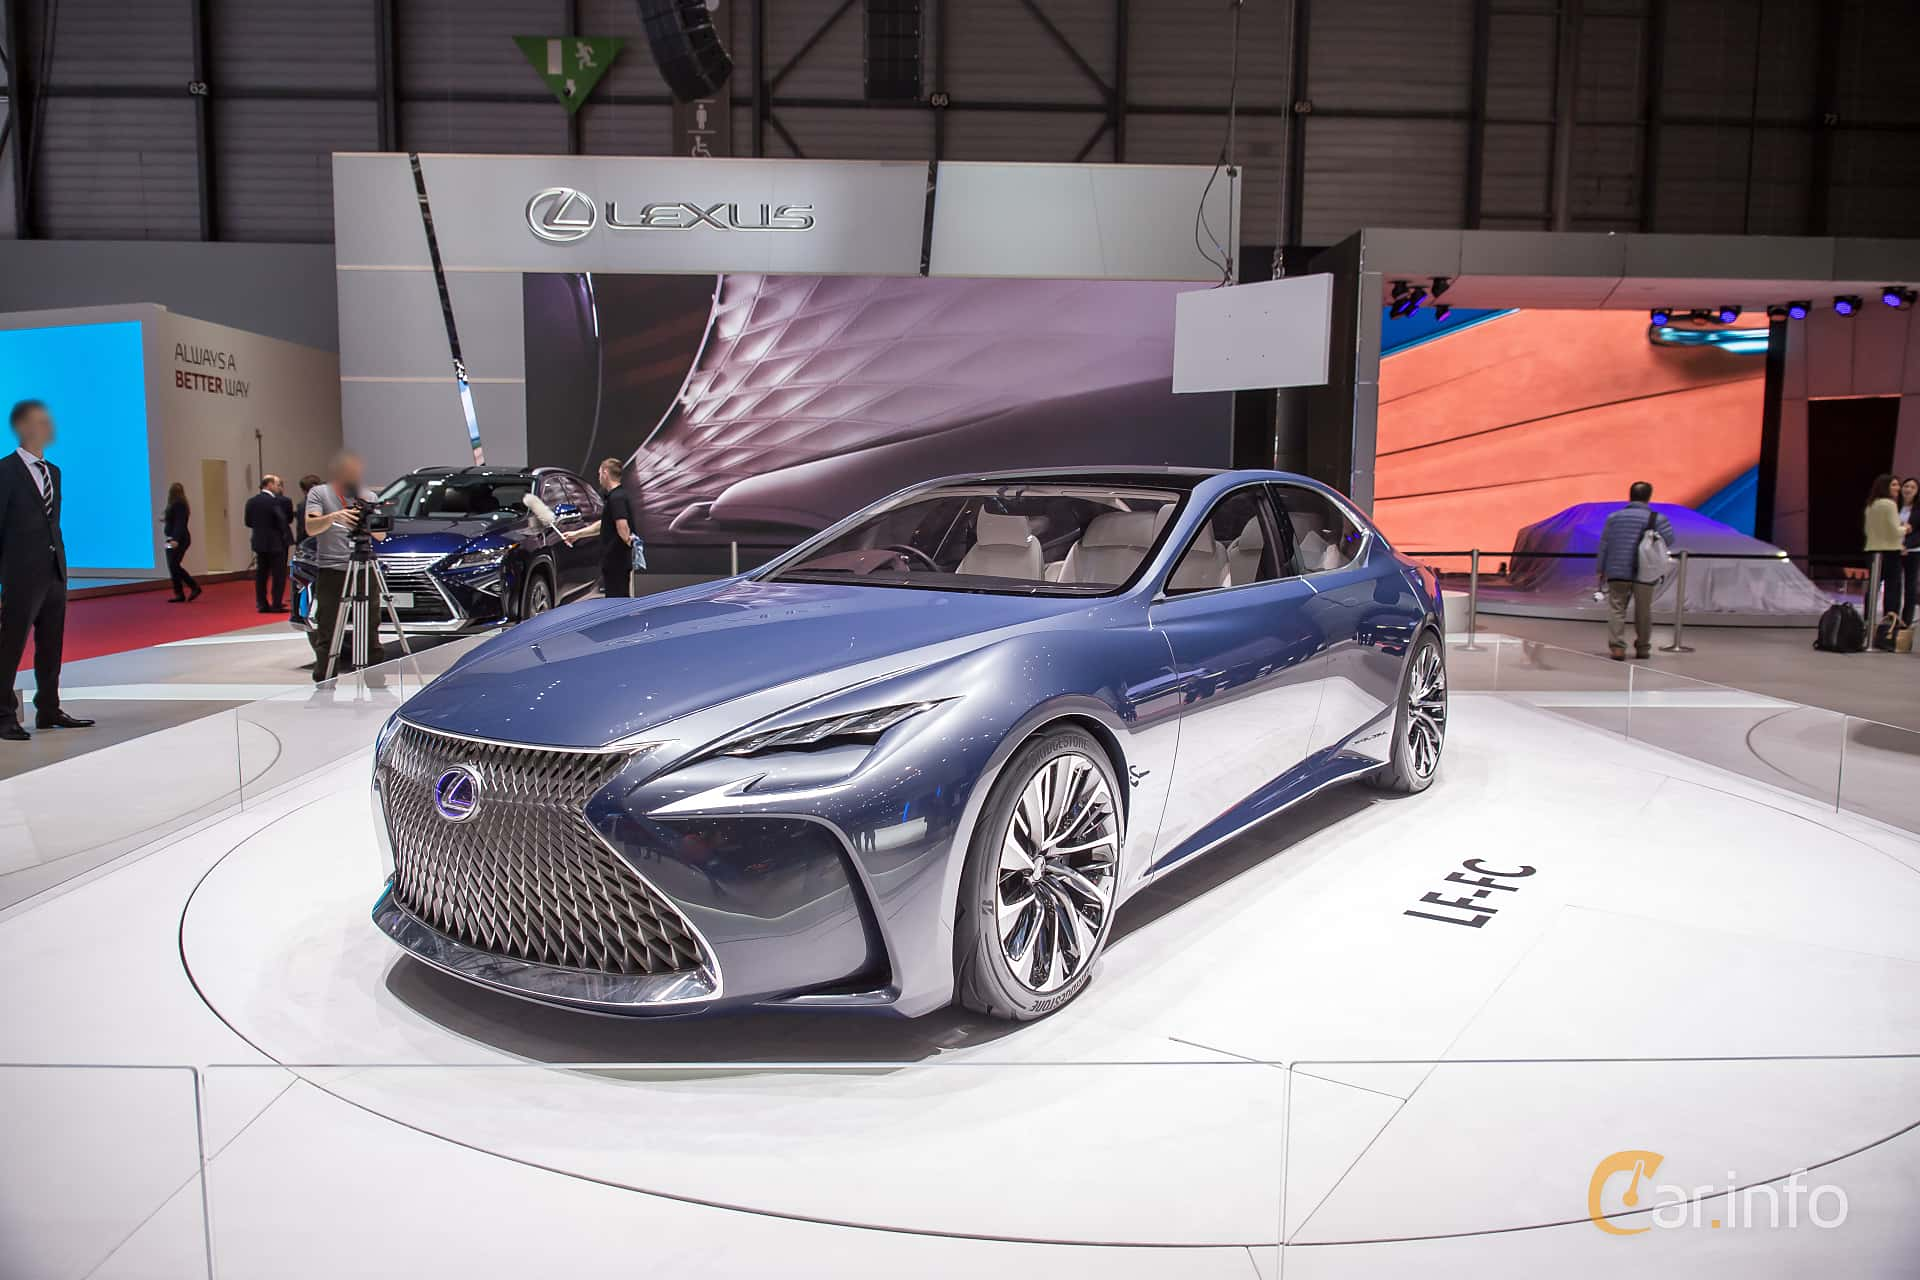 https://s.car.info/image_files/1920/lexus-lf-fc-front-side-geneva-motor-show-2016-2-200691.jpg